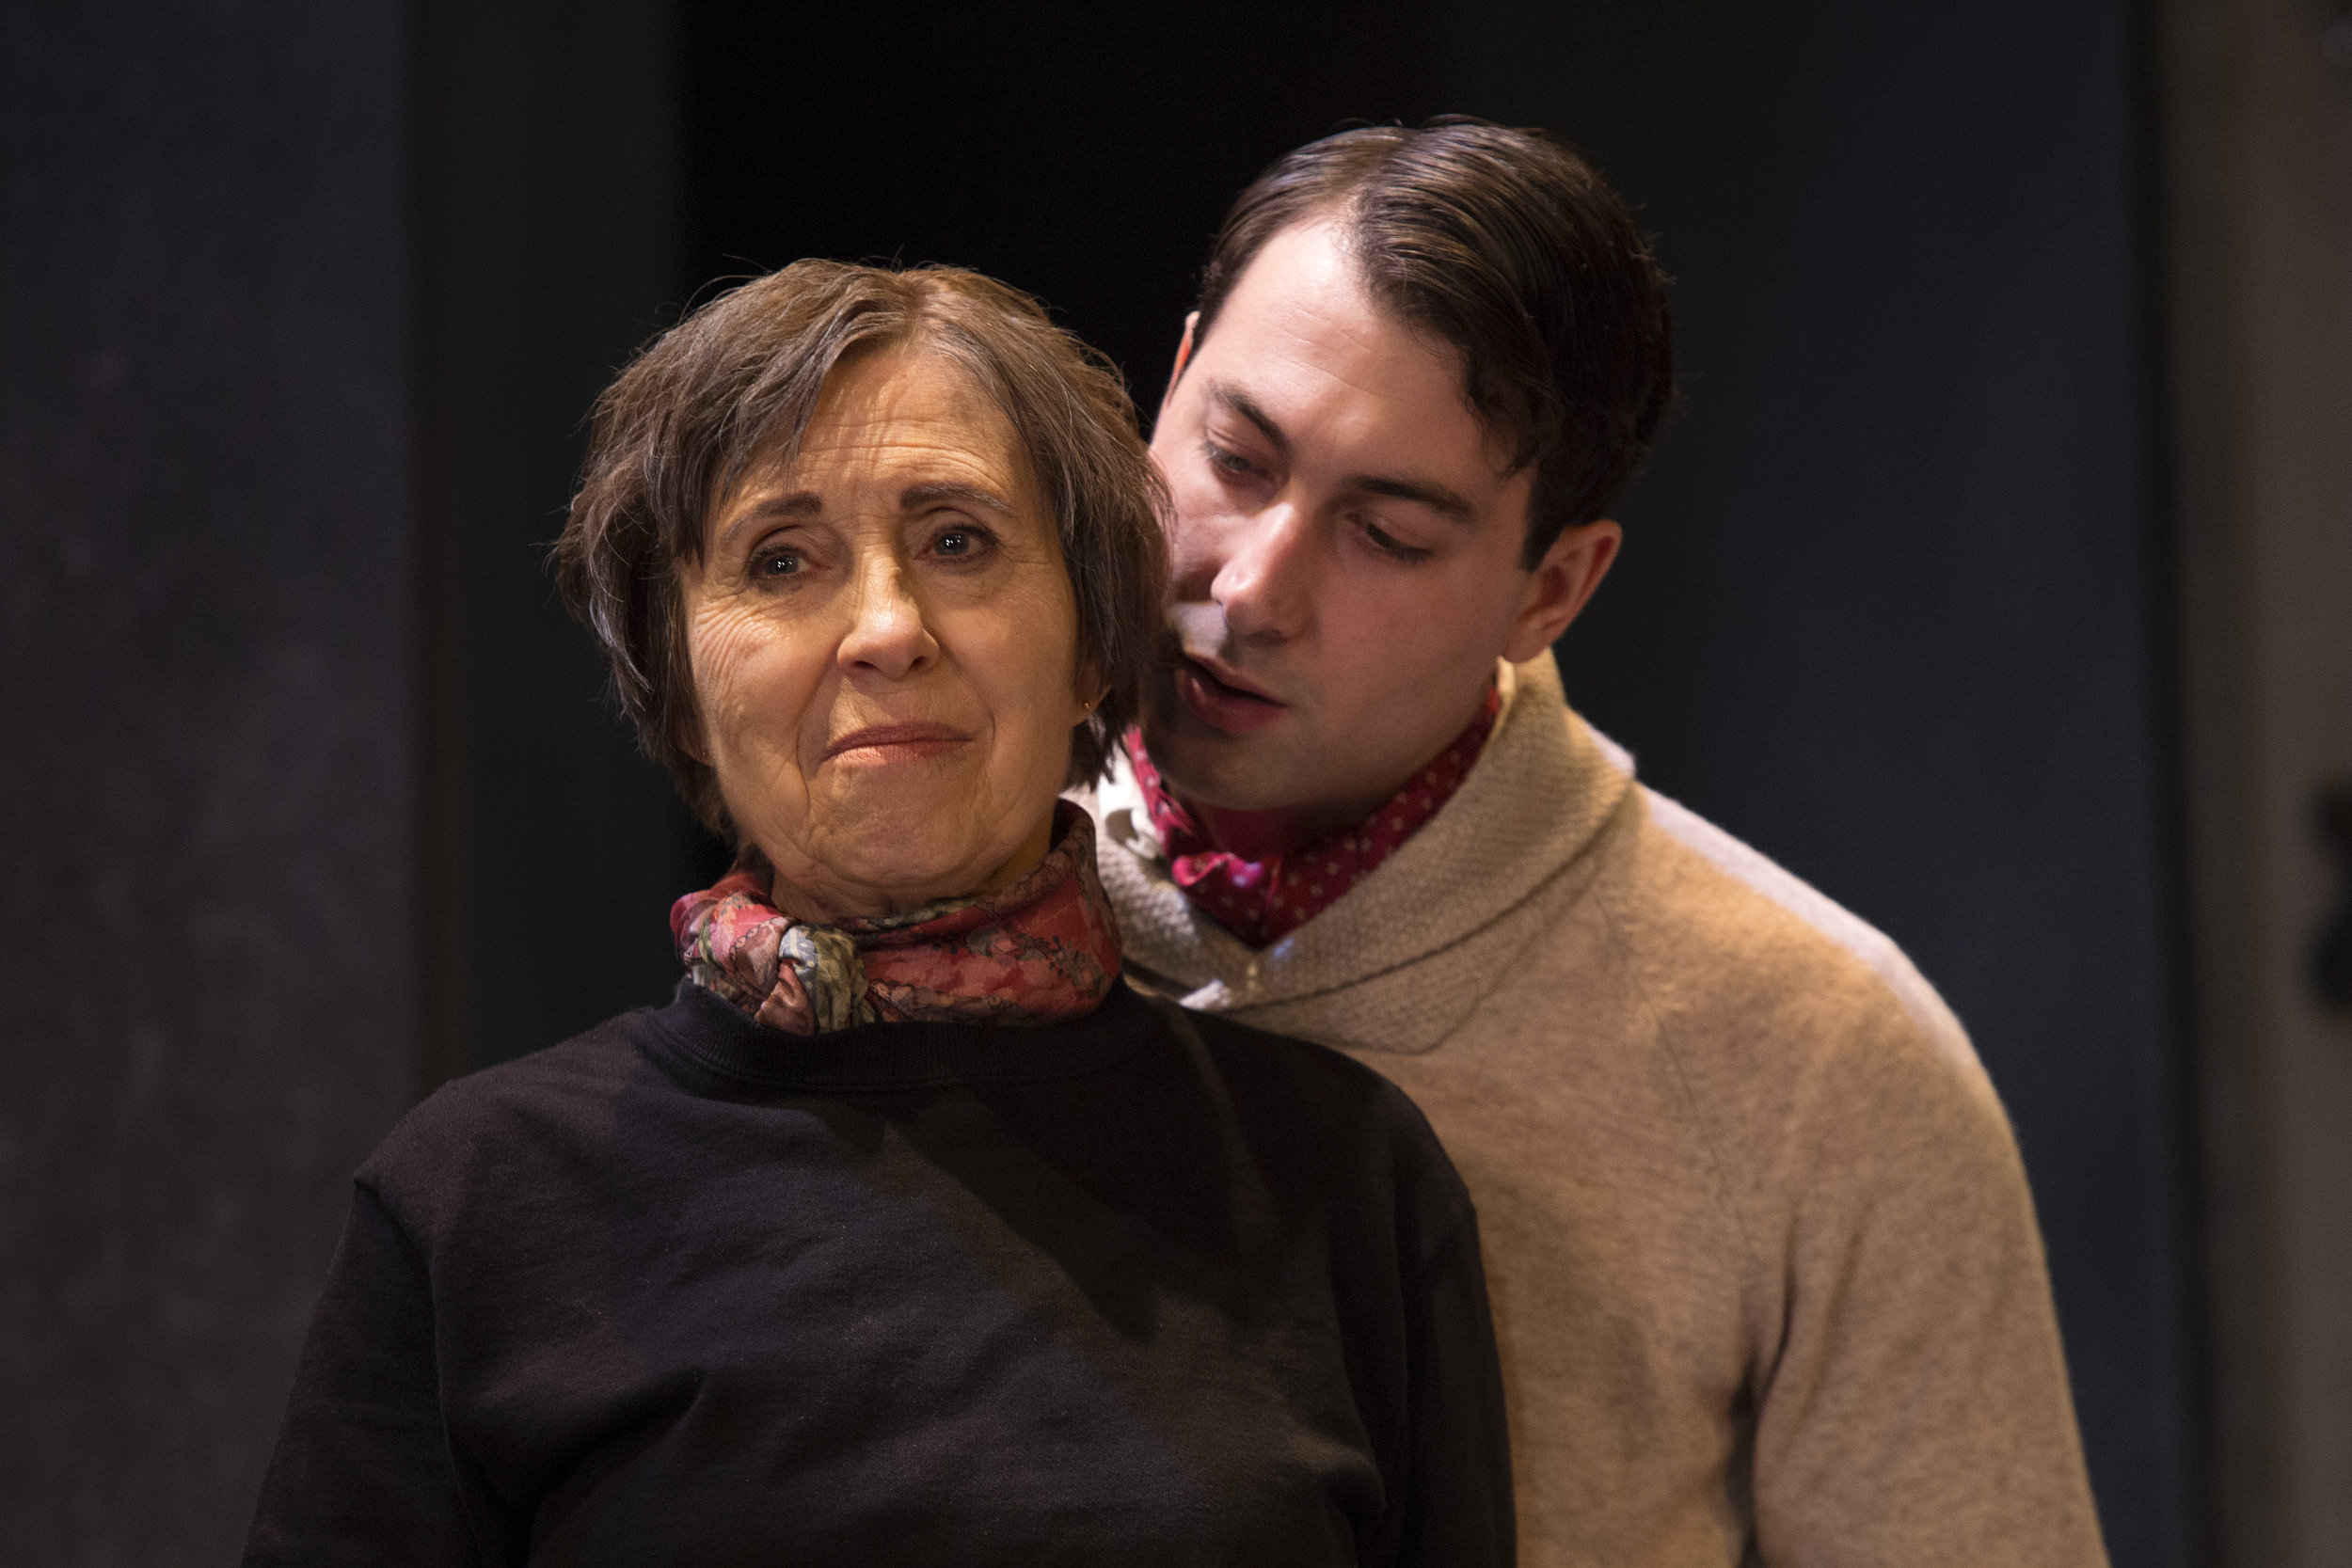 Switzerland03 Actors Jenny Davis and Giuseppe Rotondella. Photo credit Philip Gostelow.jpg